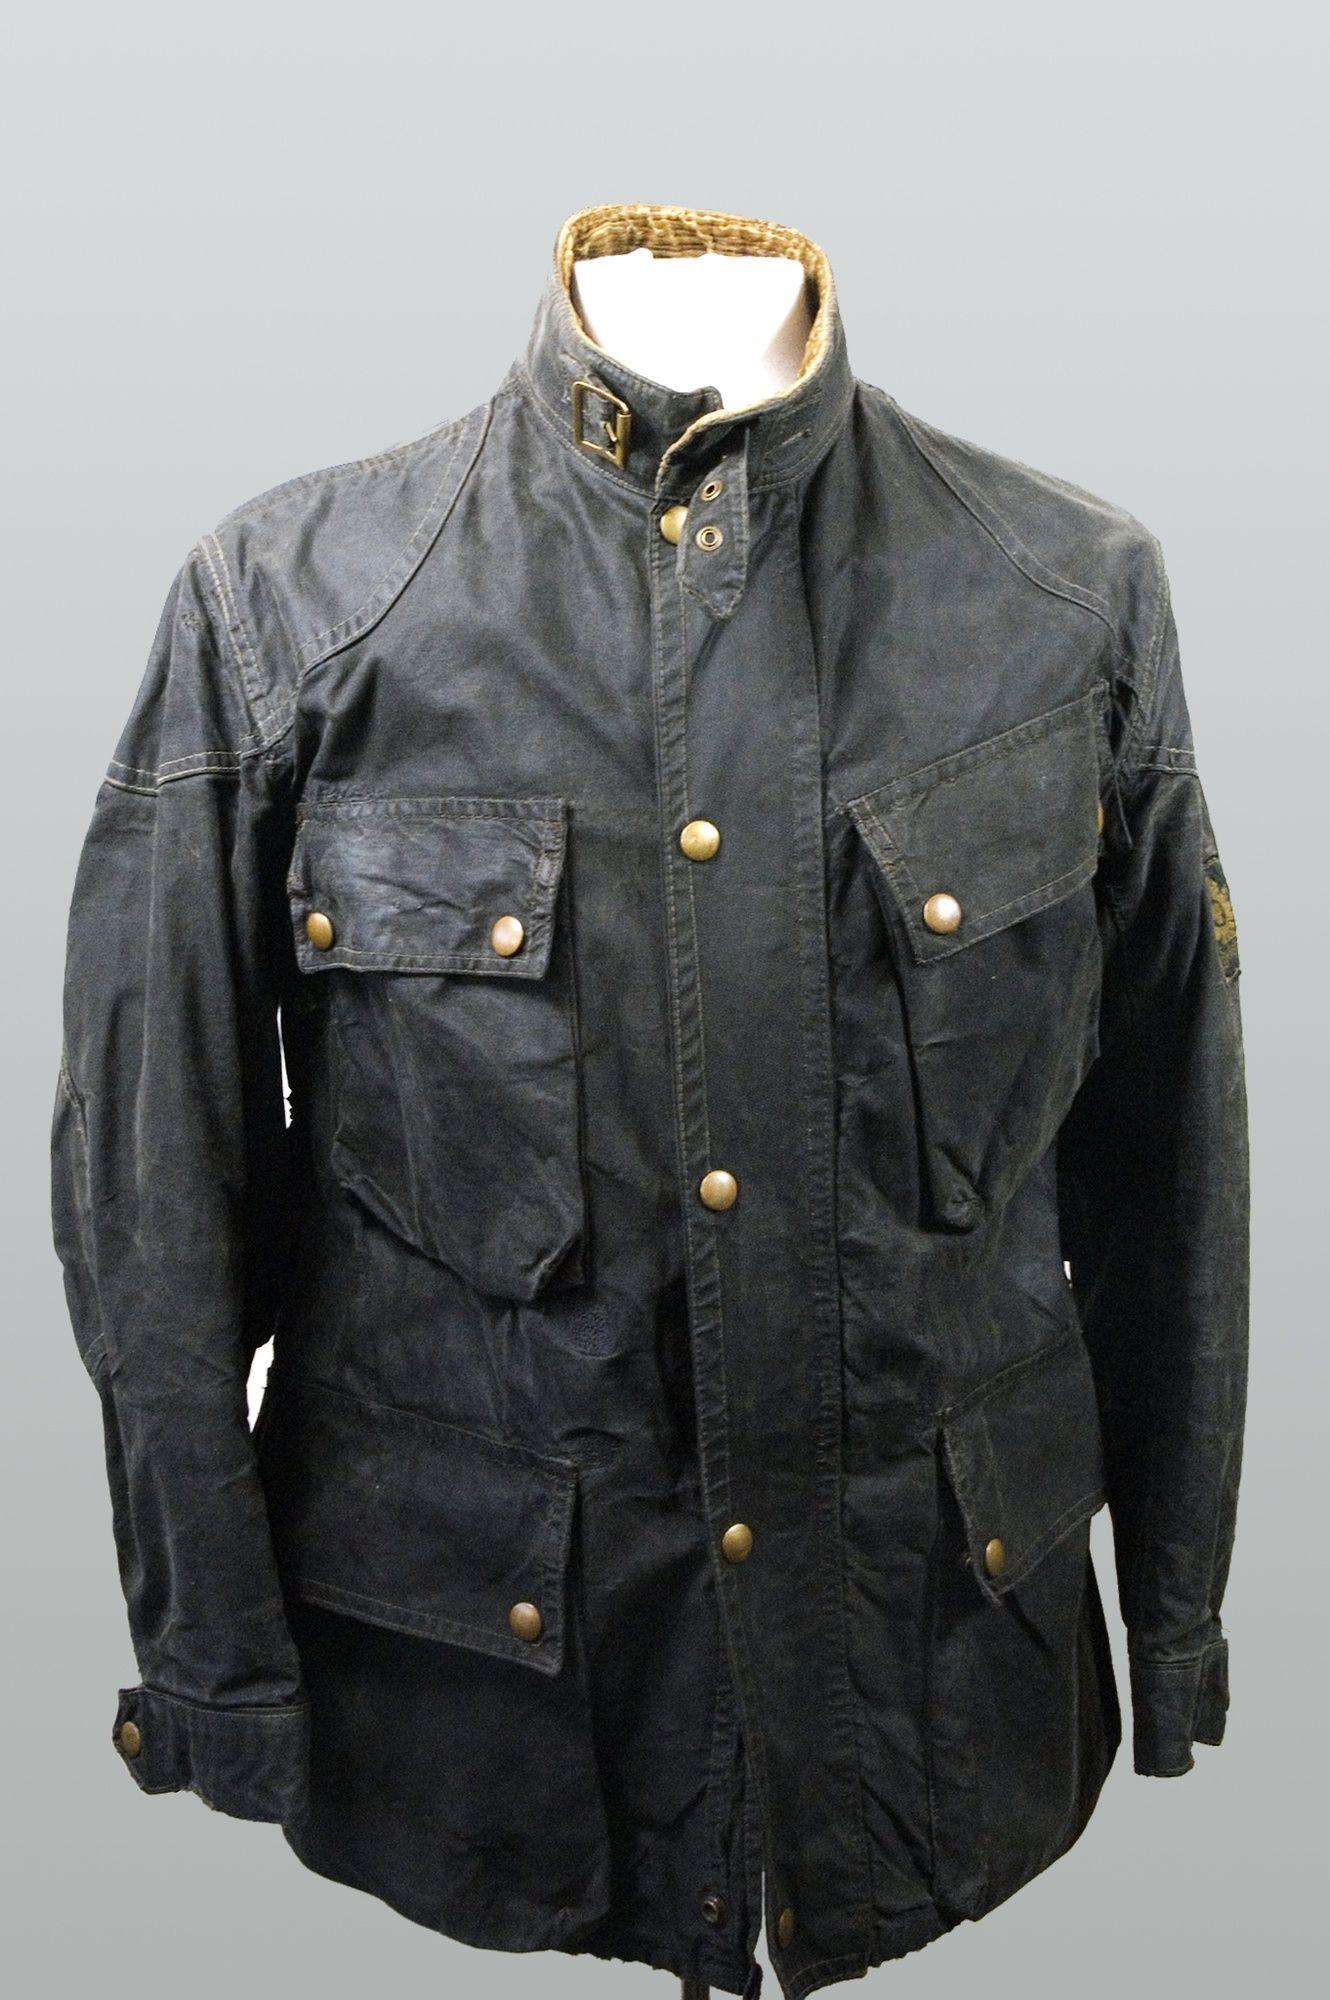 Vintage Belstaff Trialmaster Jacket Waxed Cotton Jacket Barbour Style Jackets